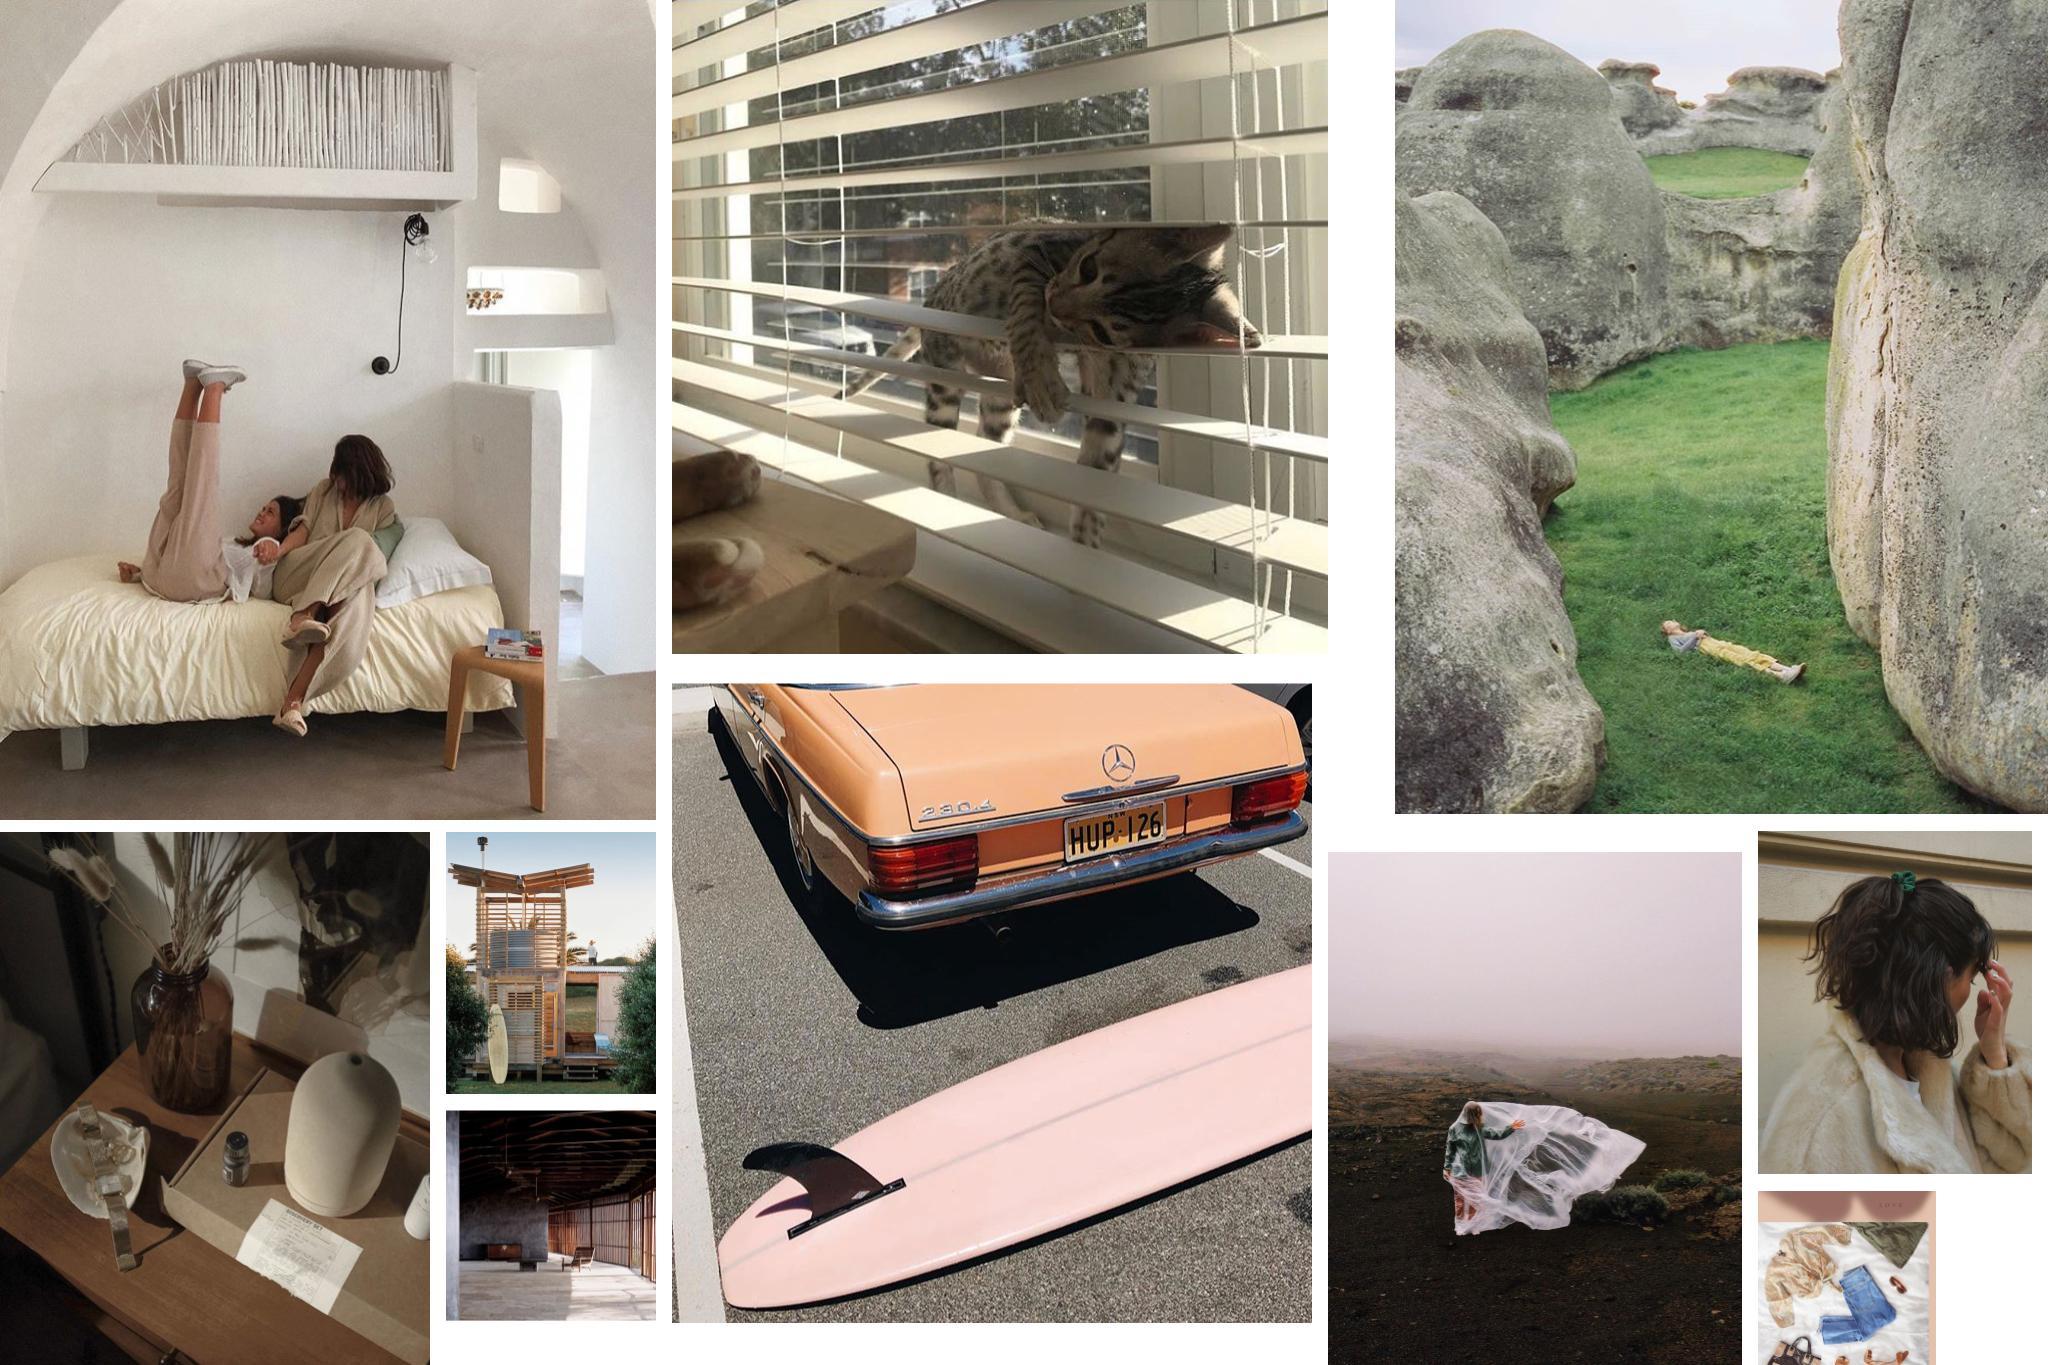 10 comptes Instagram inspirants